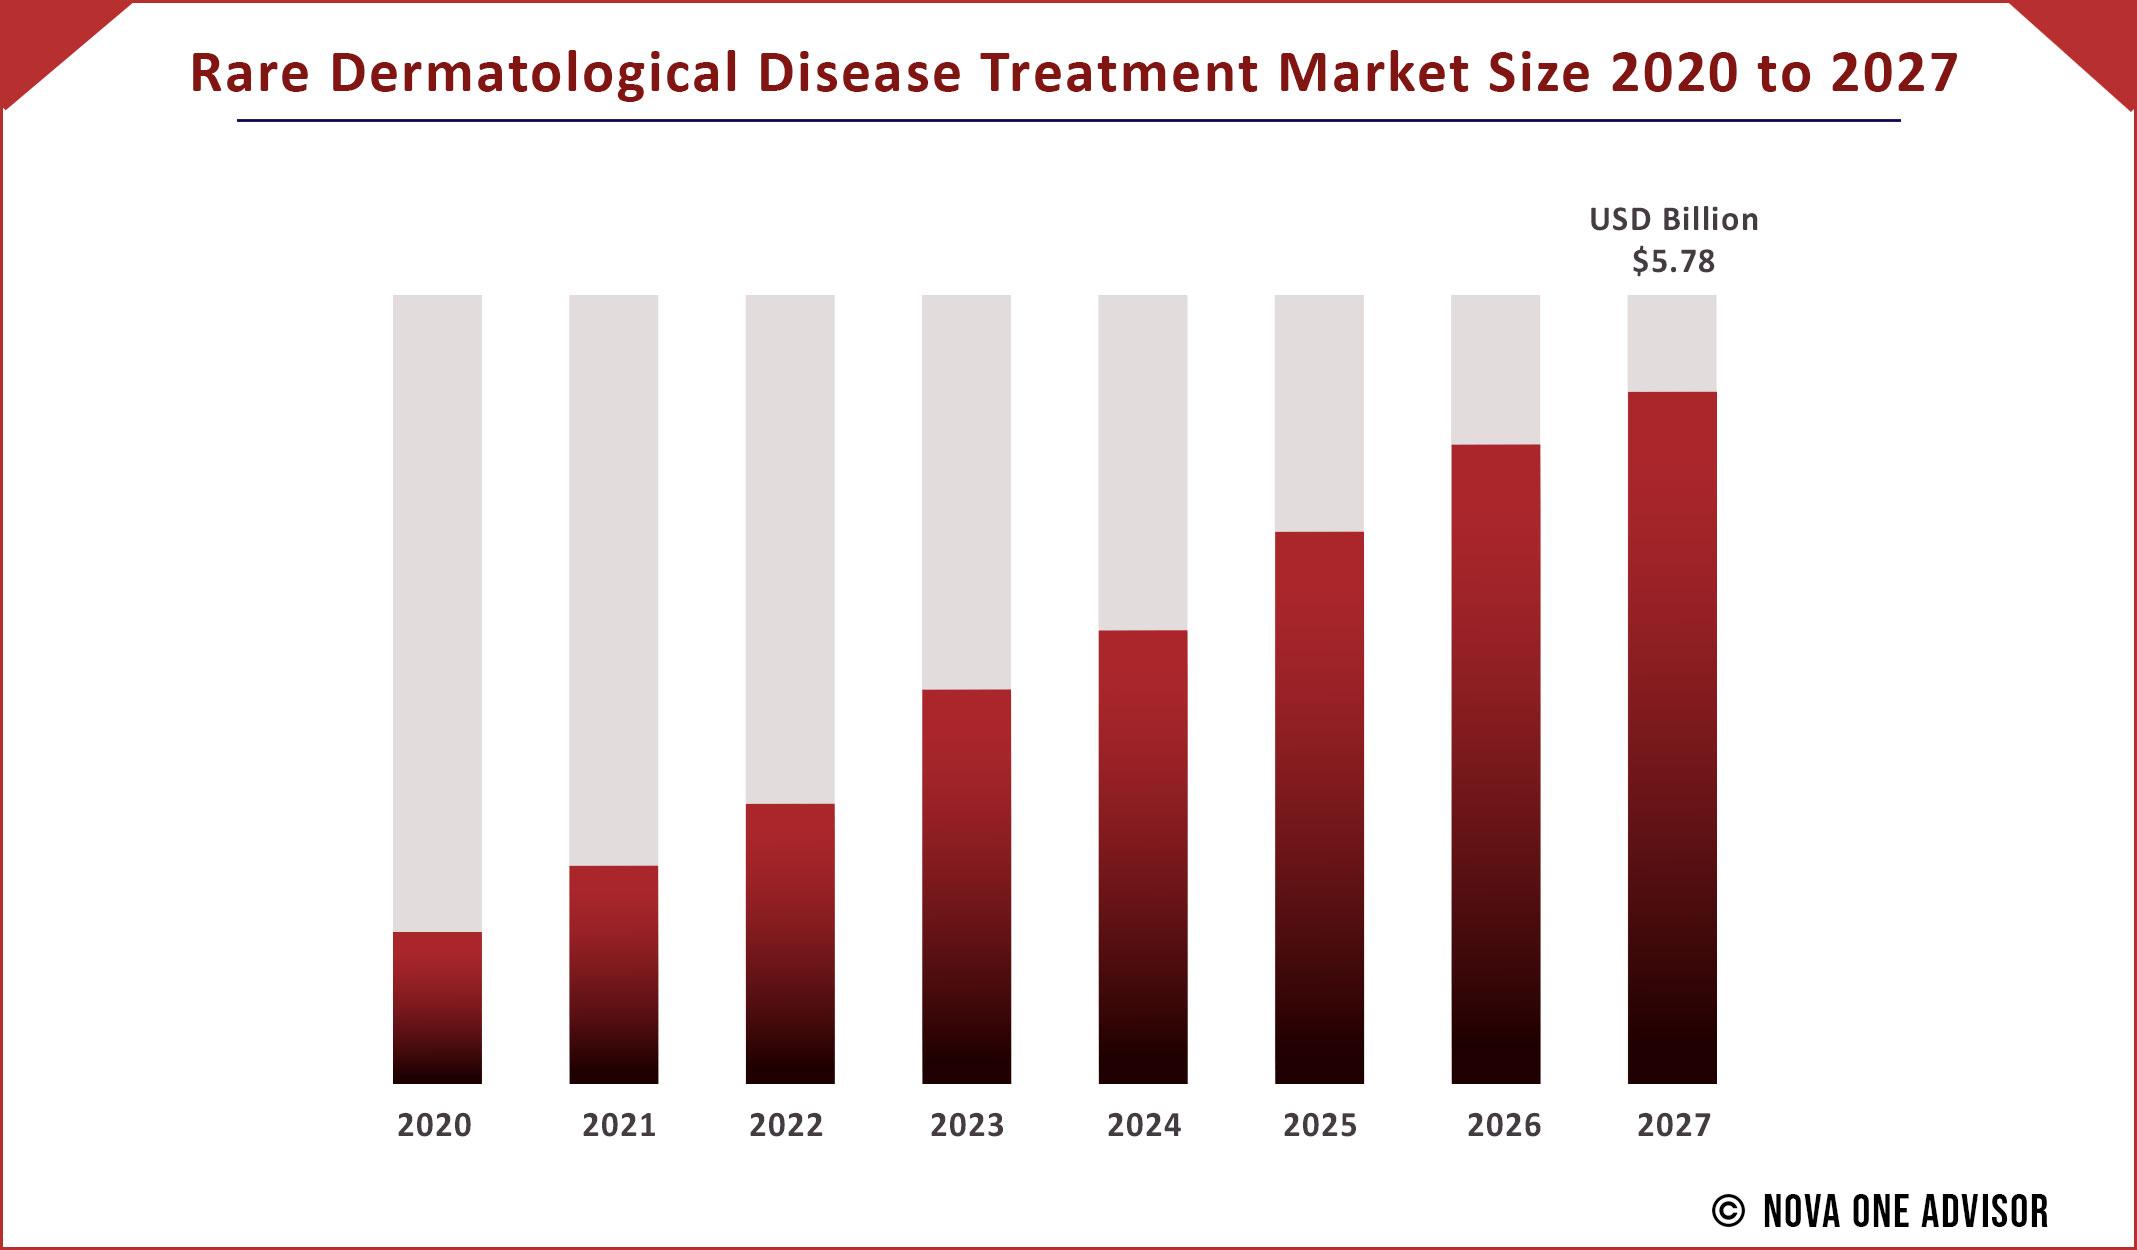 Rare Dermatological Disease Treatment Market Size 2020 to 2027